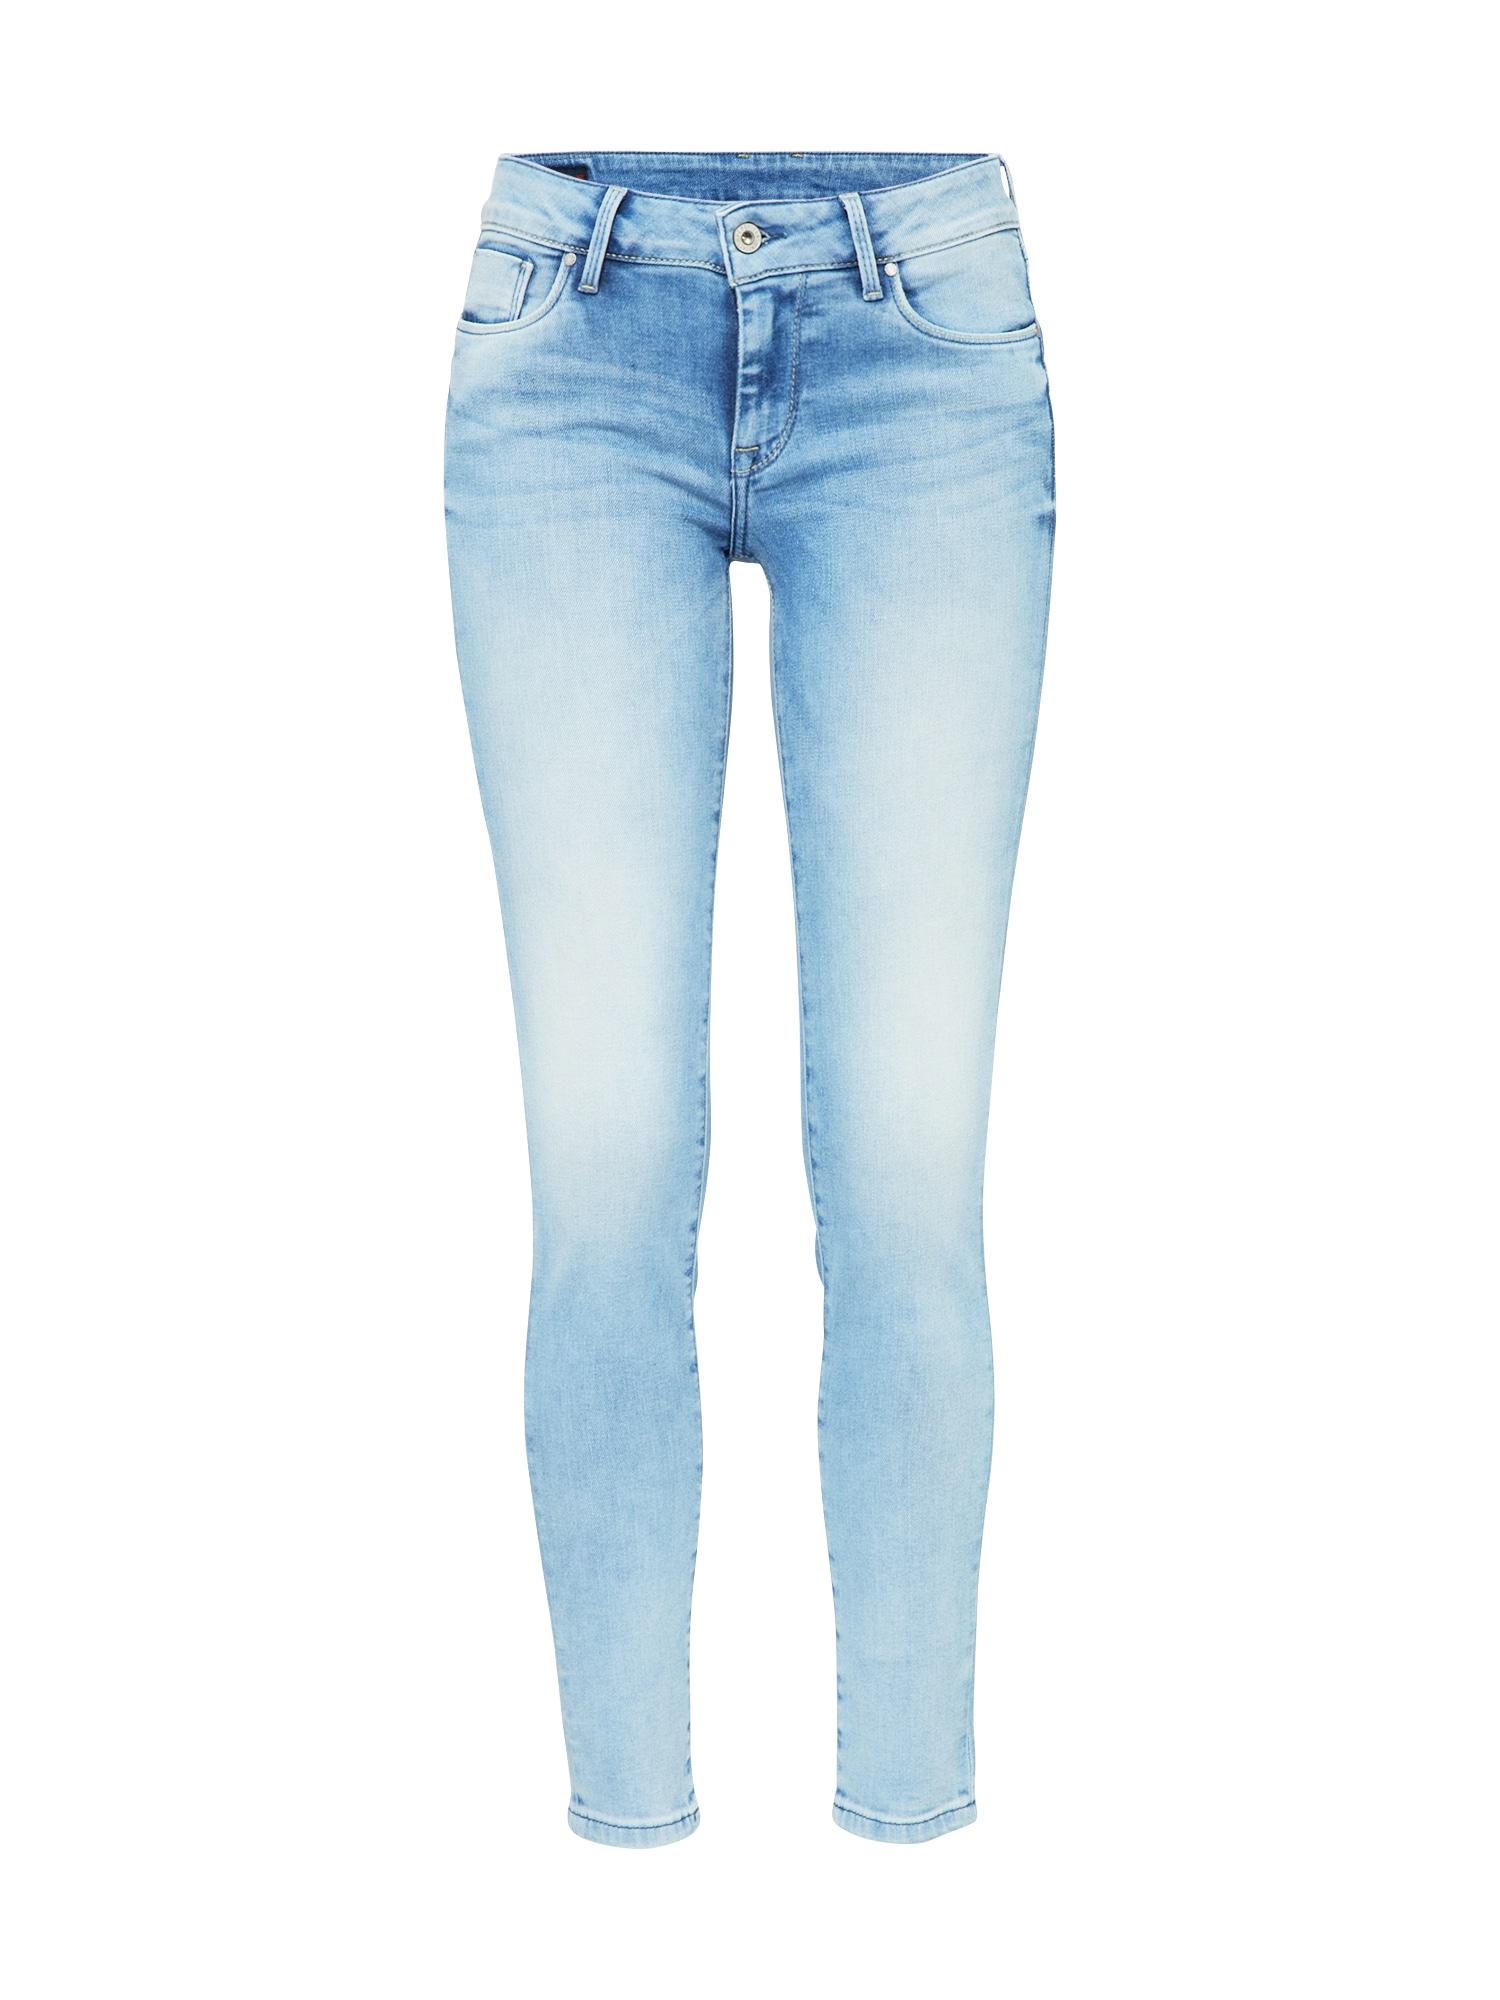 Pepe Jeans Dames Jeans Soho blauw